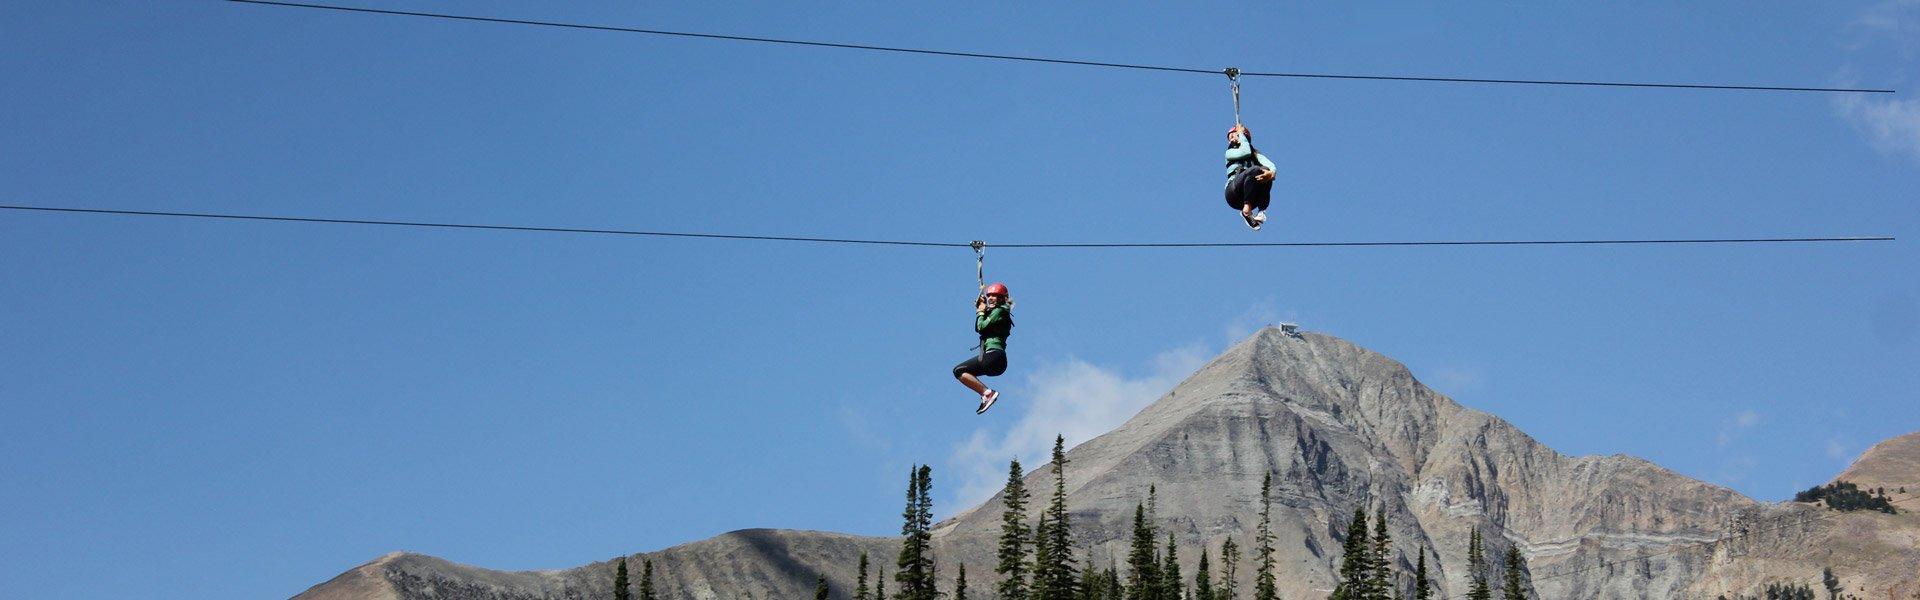 Summer Adventure Zipline Header